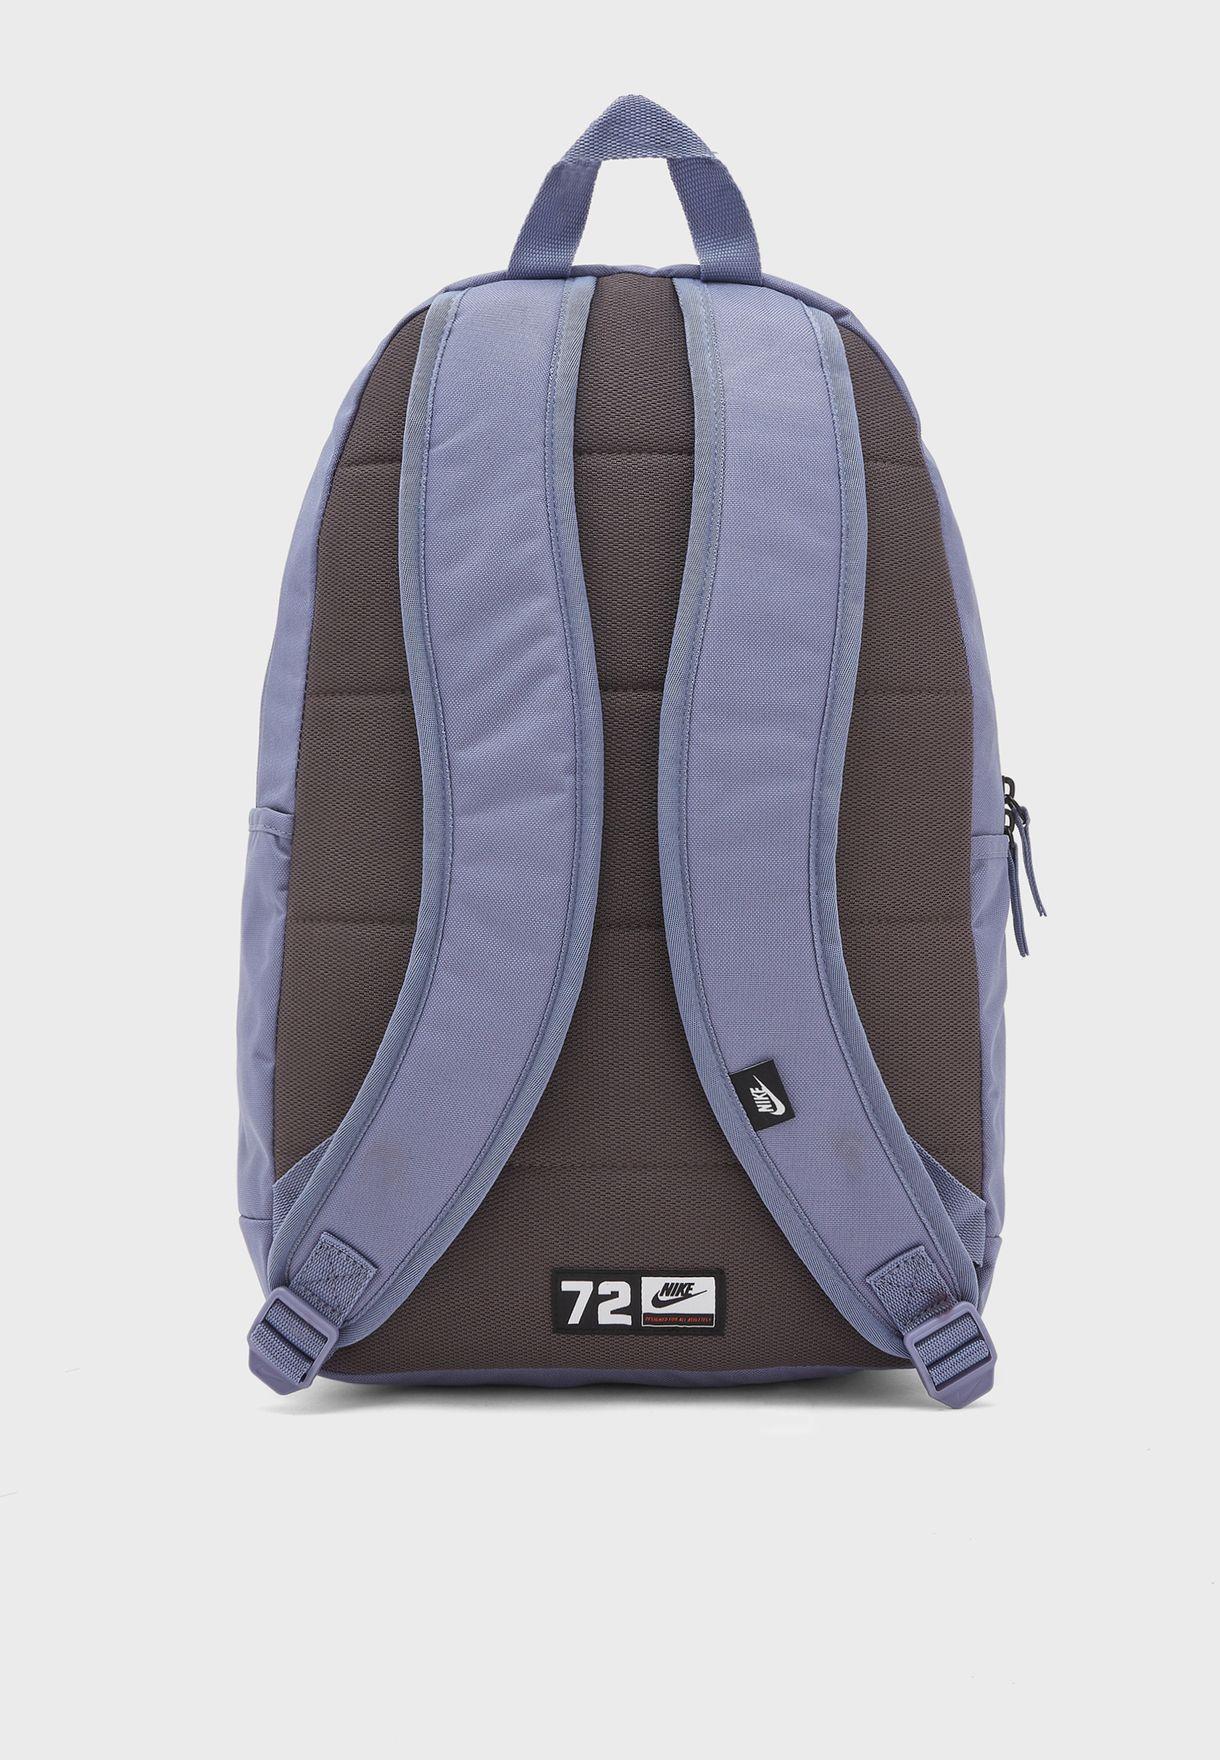 Elemental 2.0 Backpack